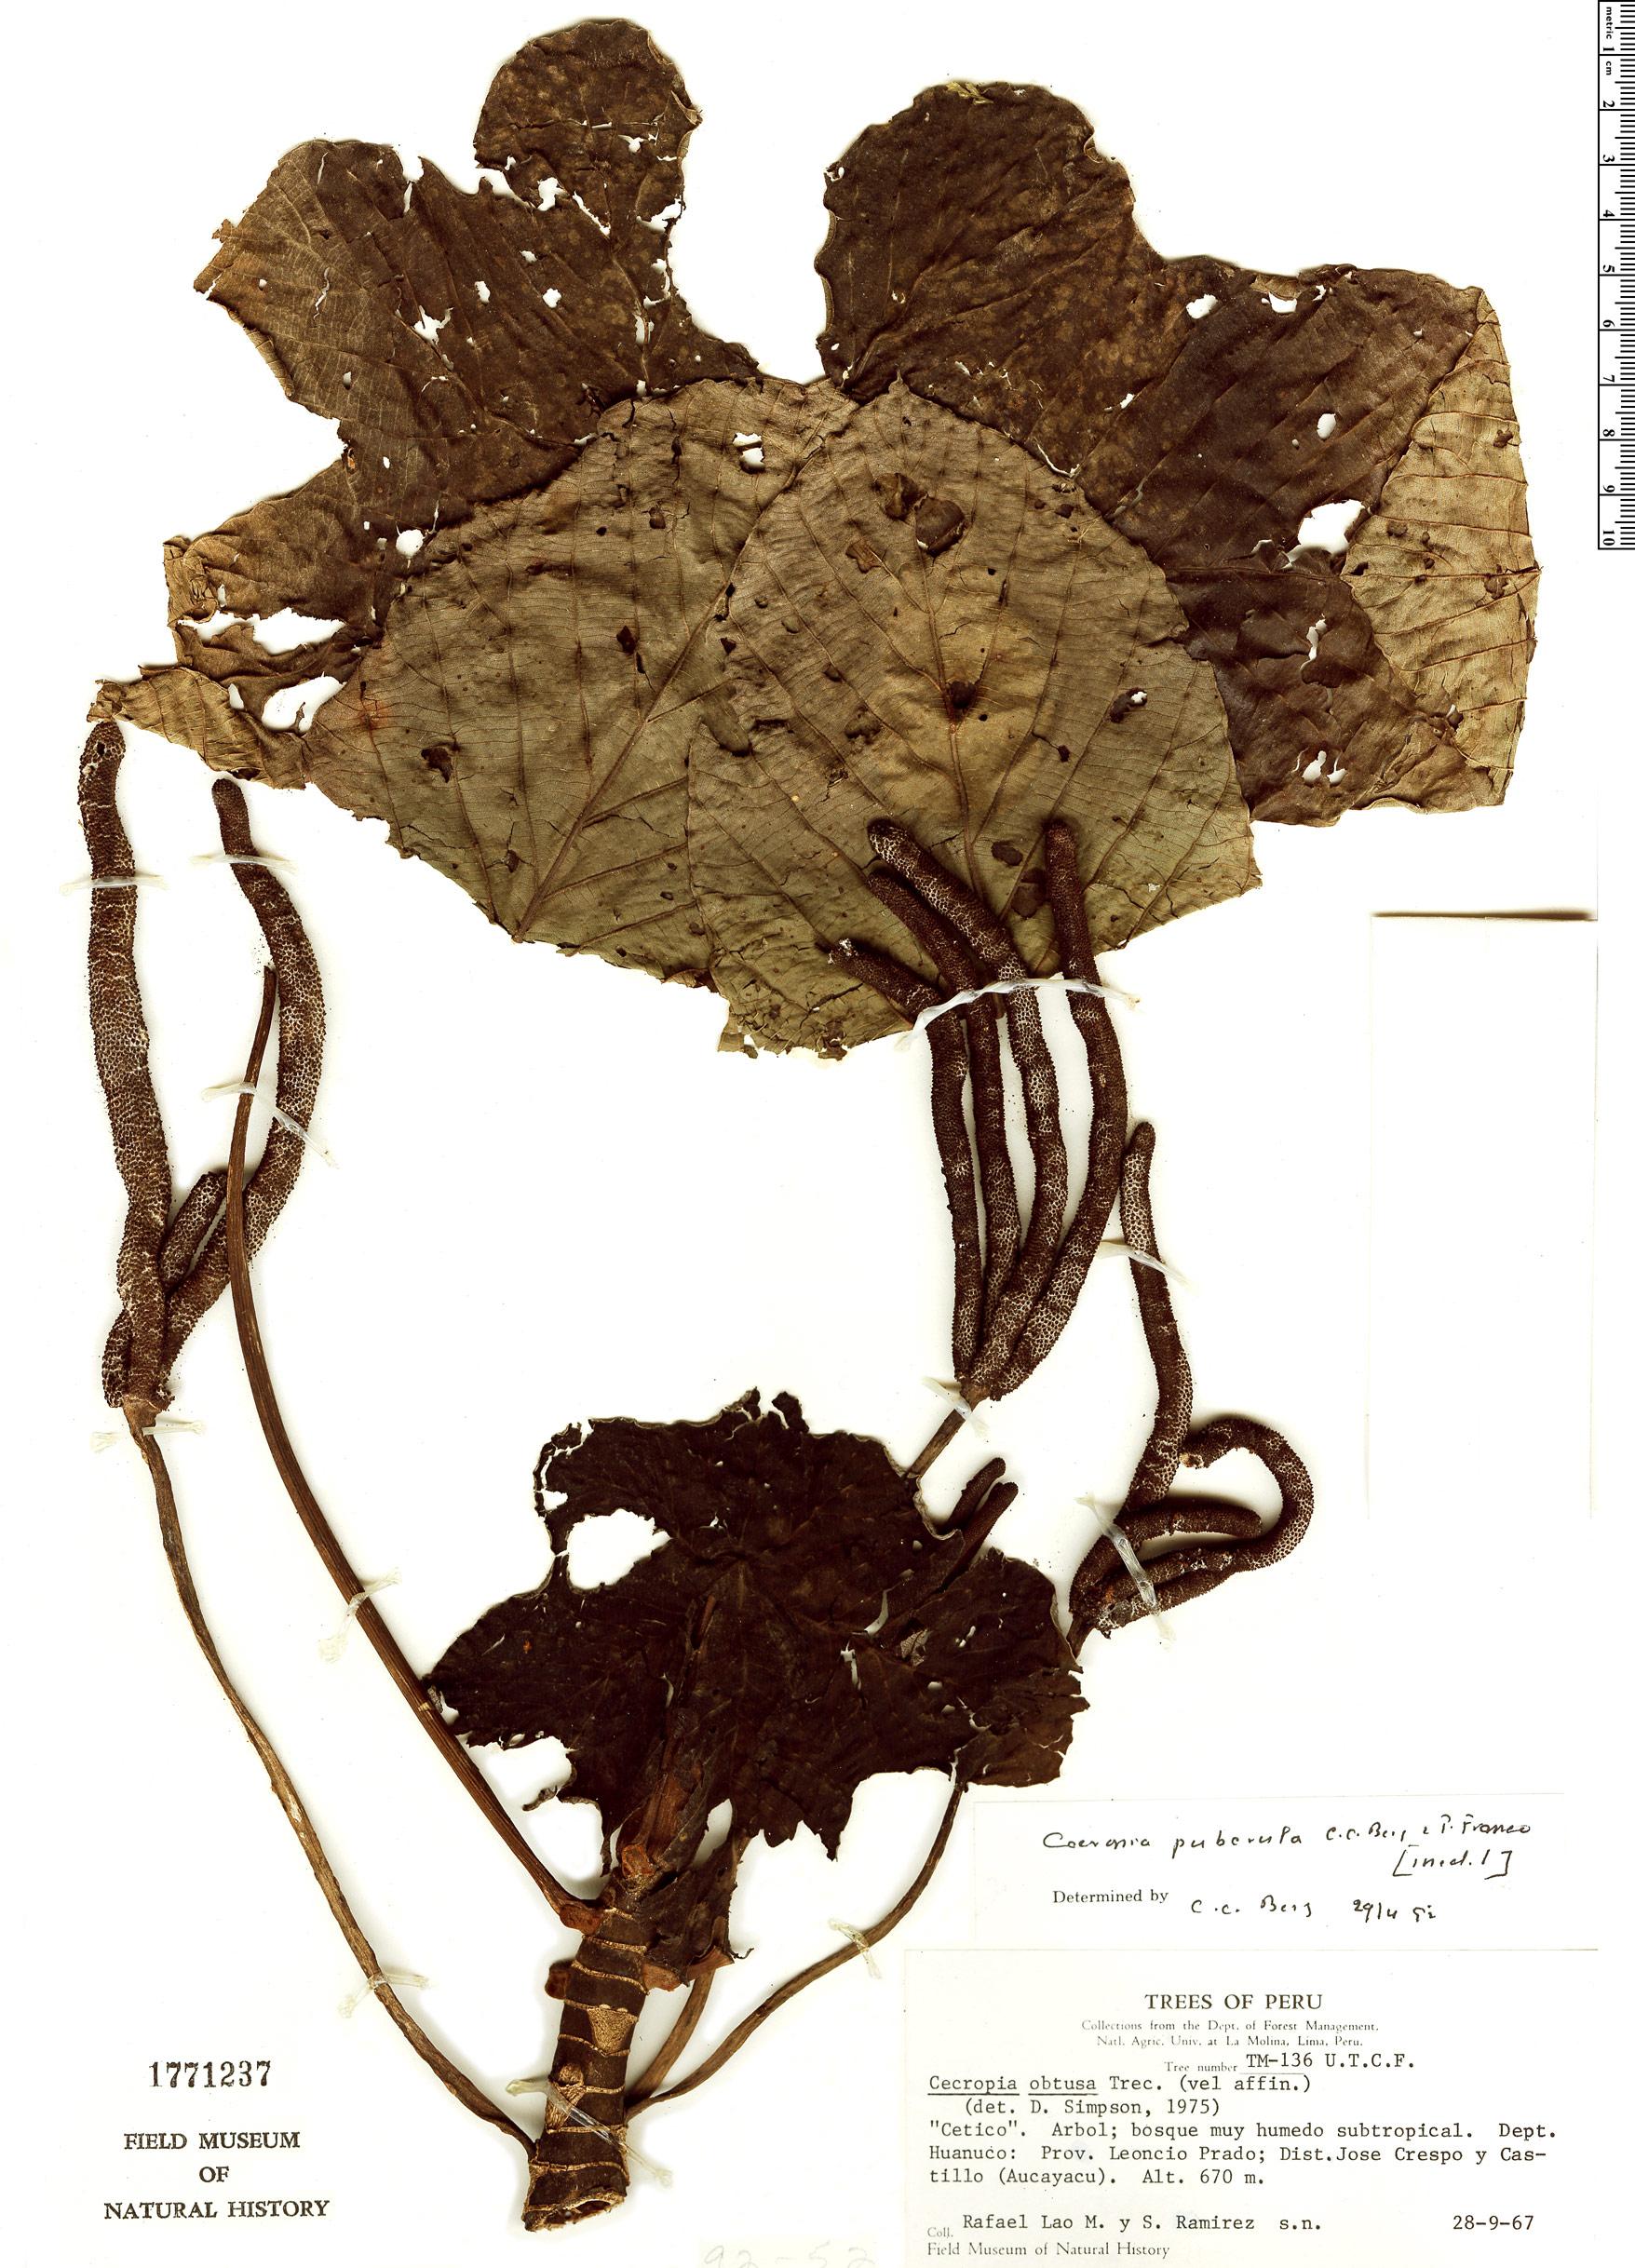 Specimen: Cecropia utcubambana